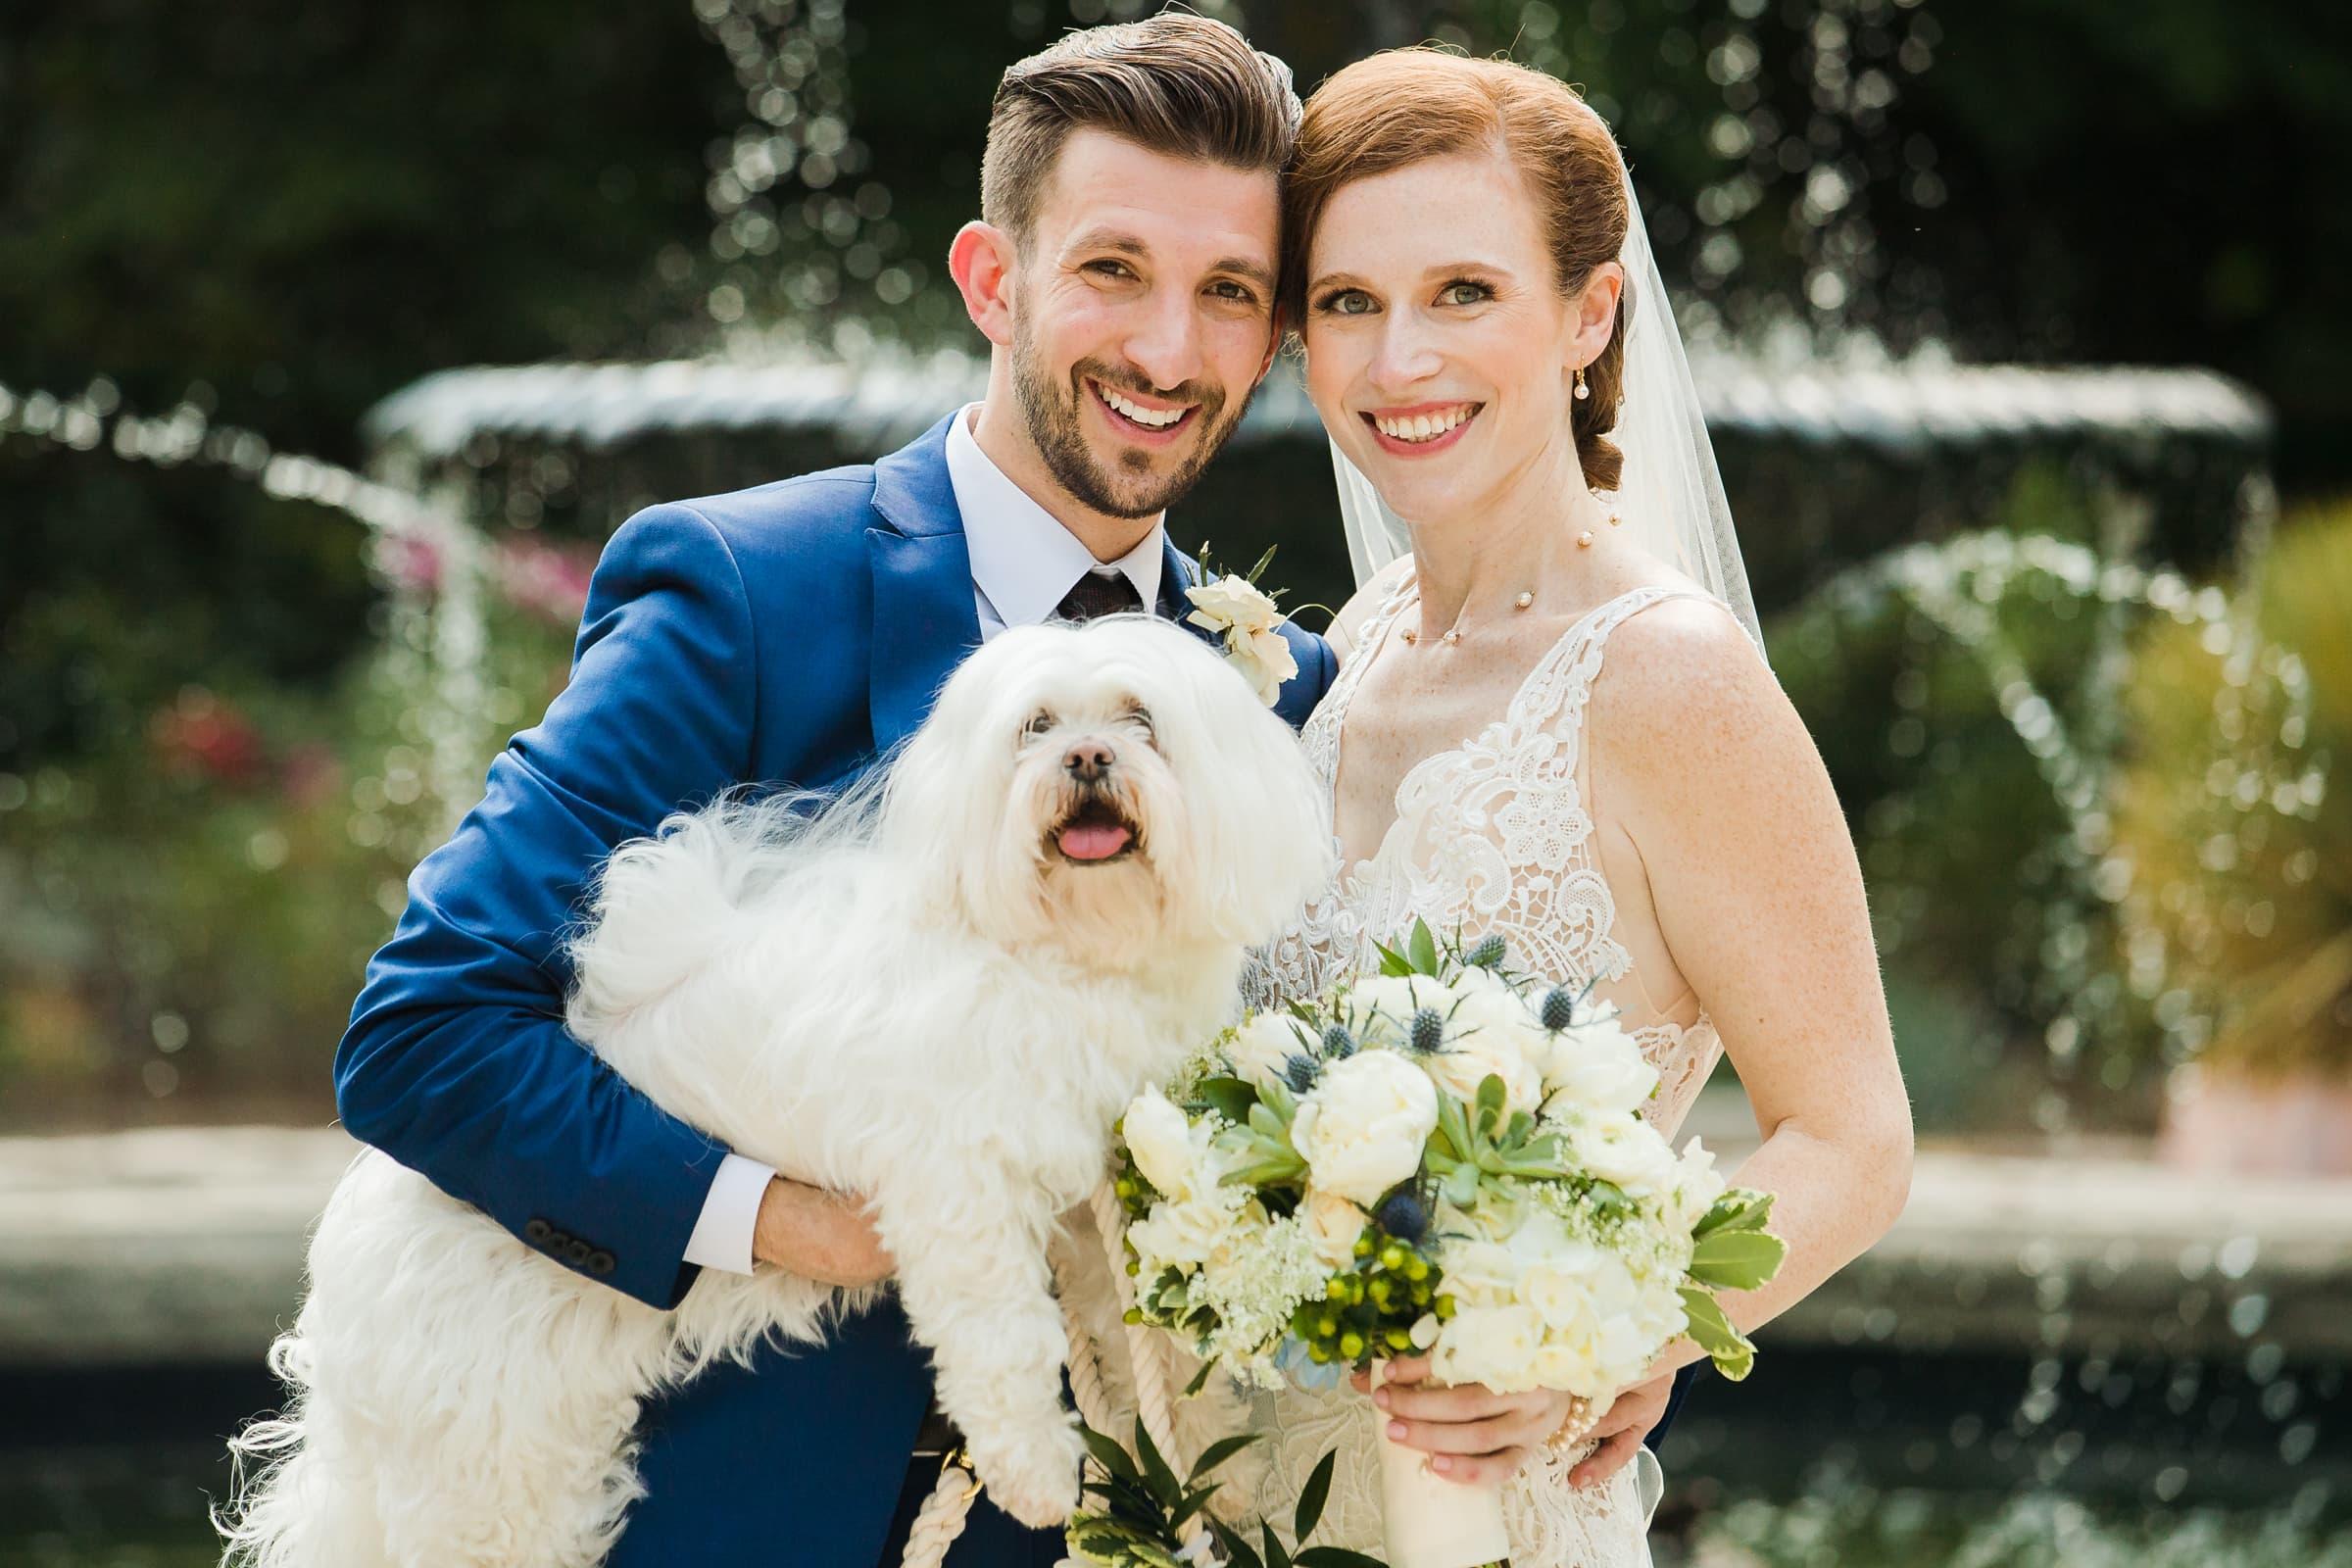 Duke Chapel Wedding Photography - Bride and Groom with dog at Duke Gardens